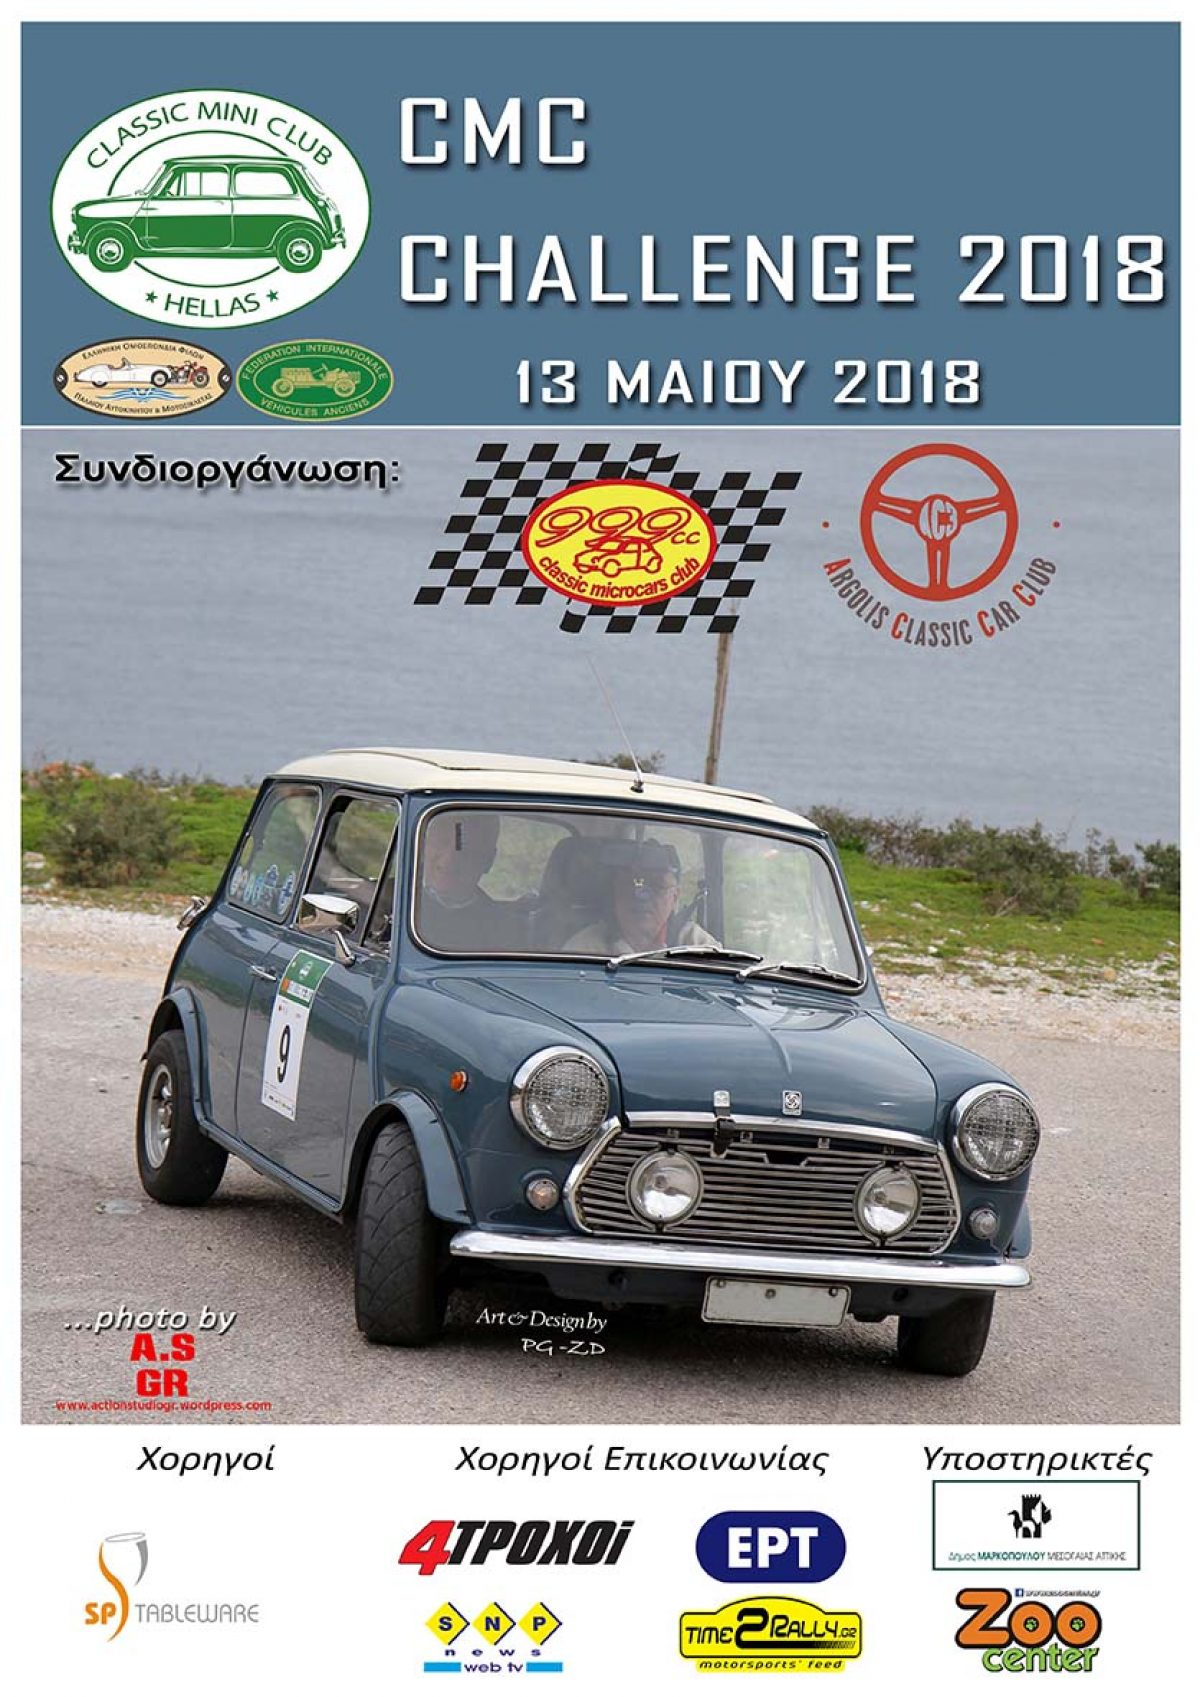 CMC CHALLENGE 2018